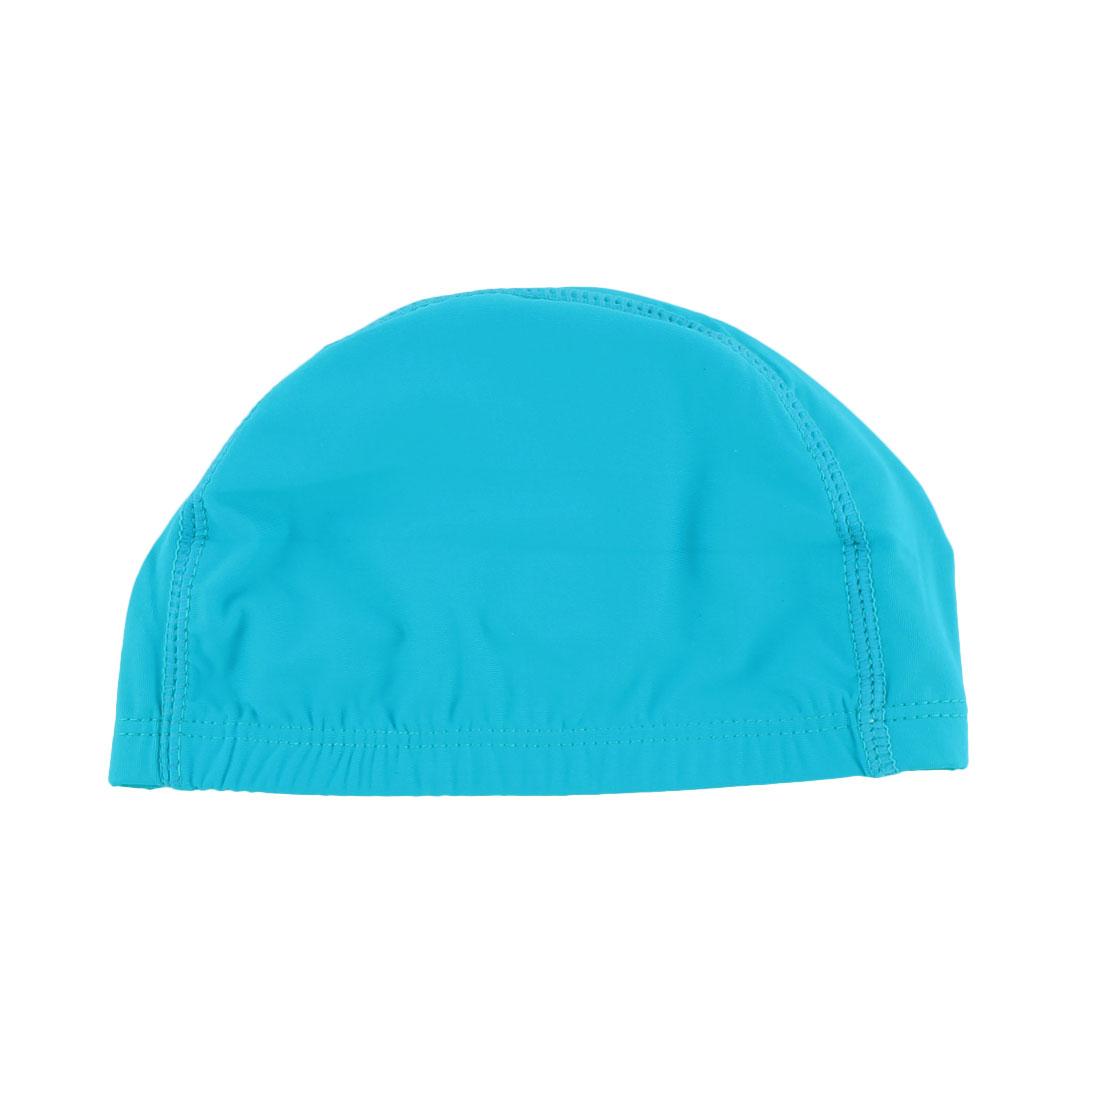 Adult Dome Shape Elasticity Swim Swimming Cap Bathing Hat Swimwear Teal Blue